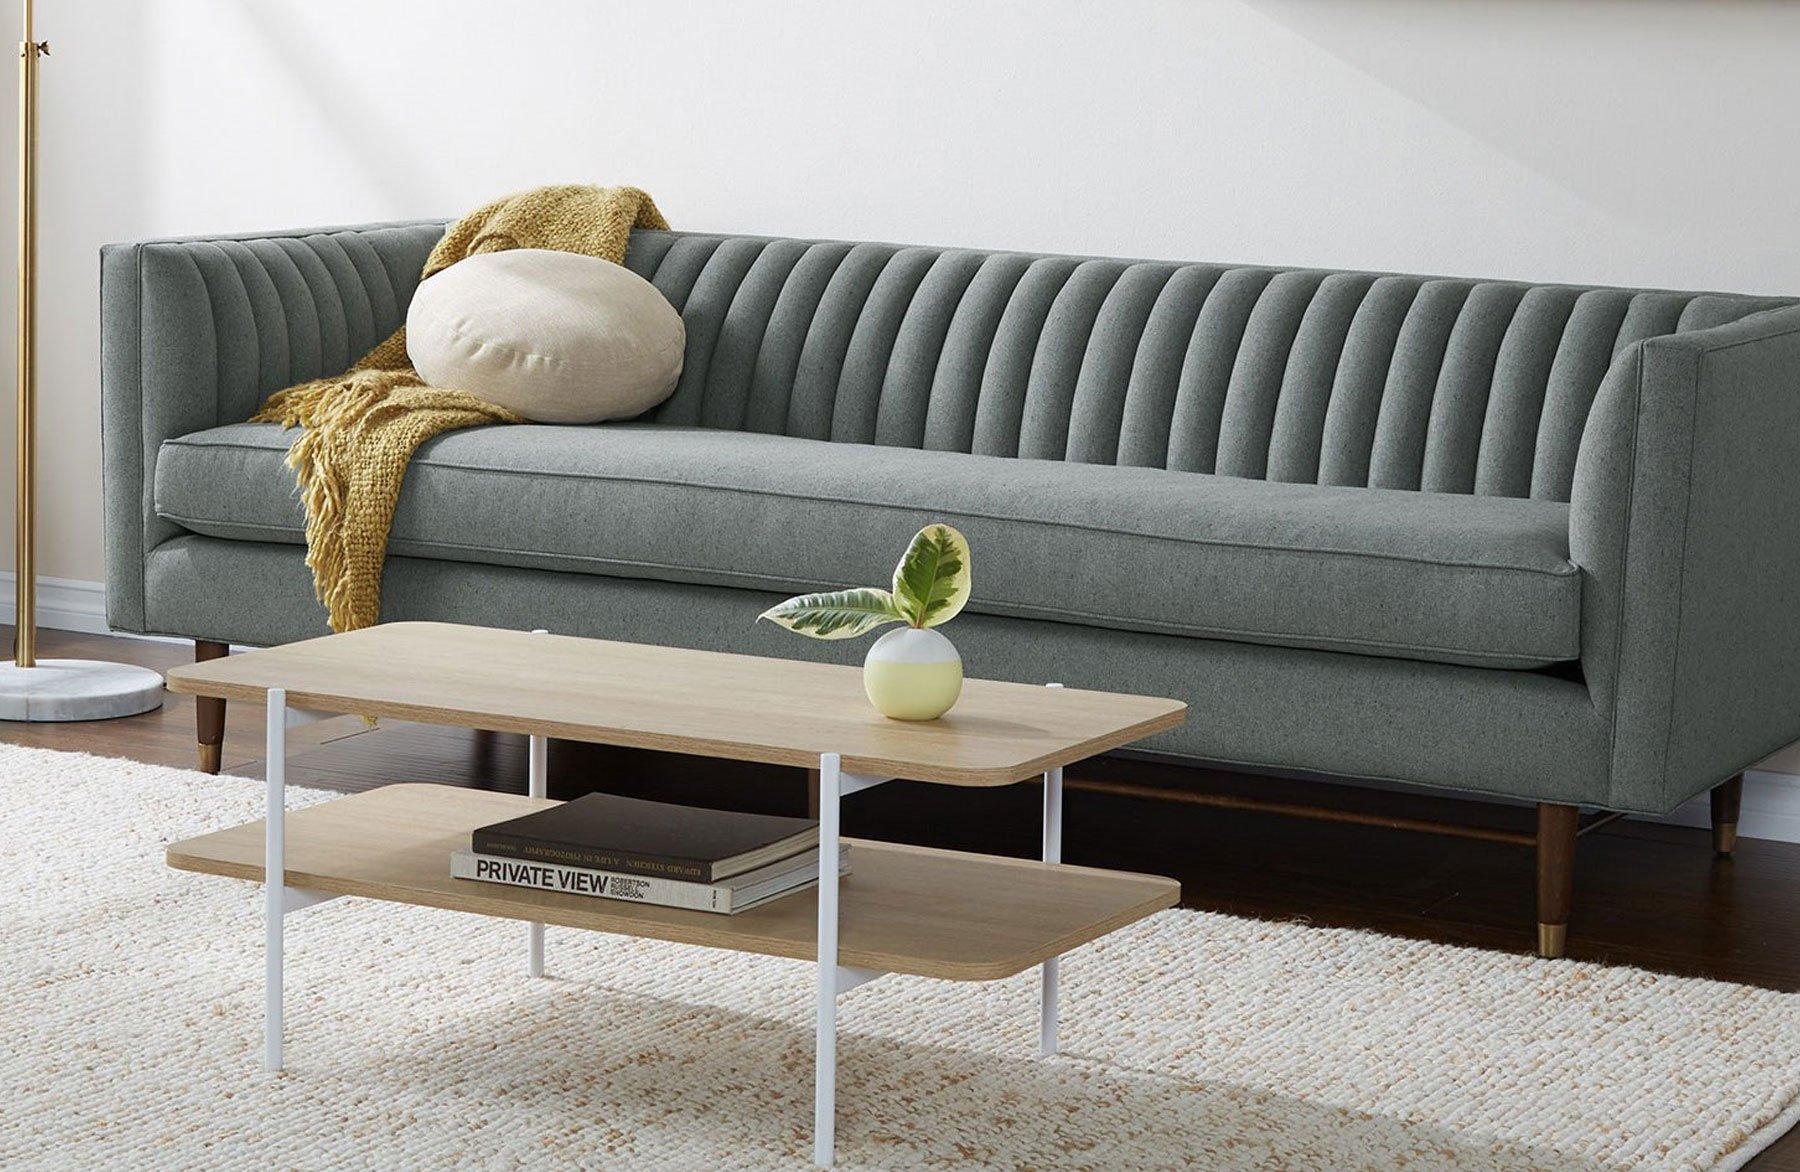 The 10 Best Sofas In A Box - Gessato